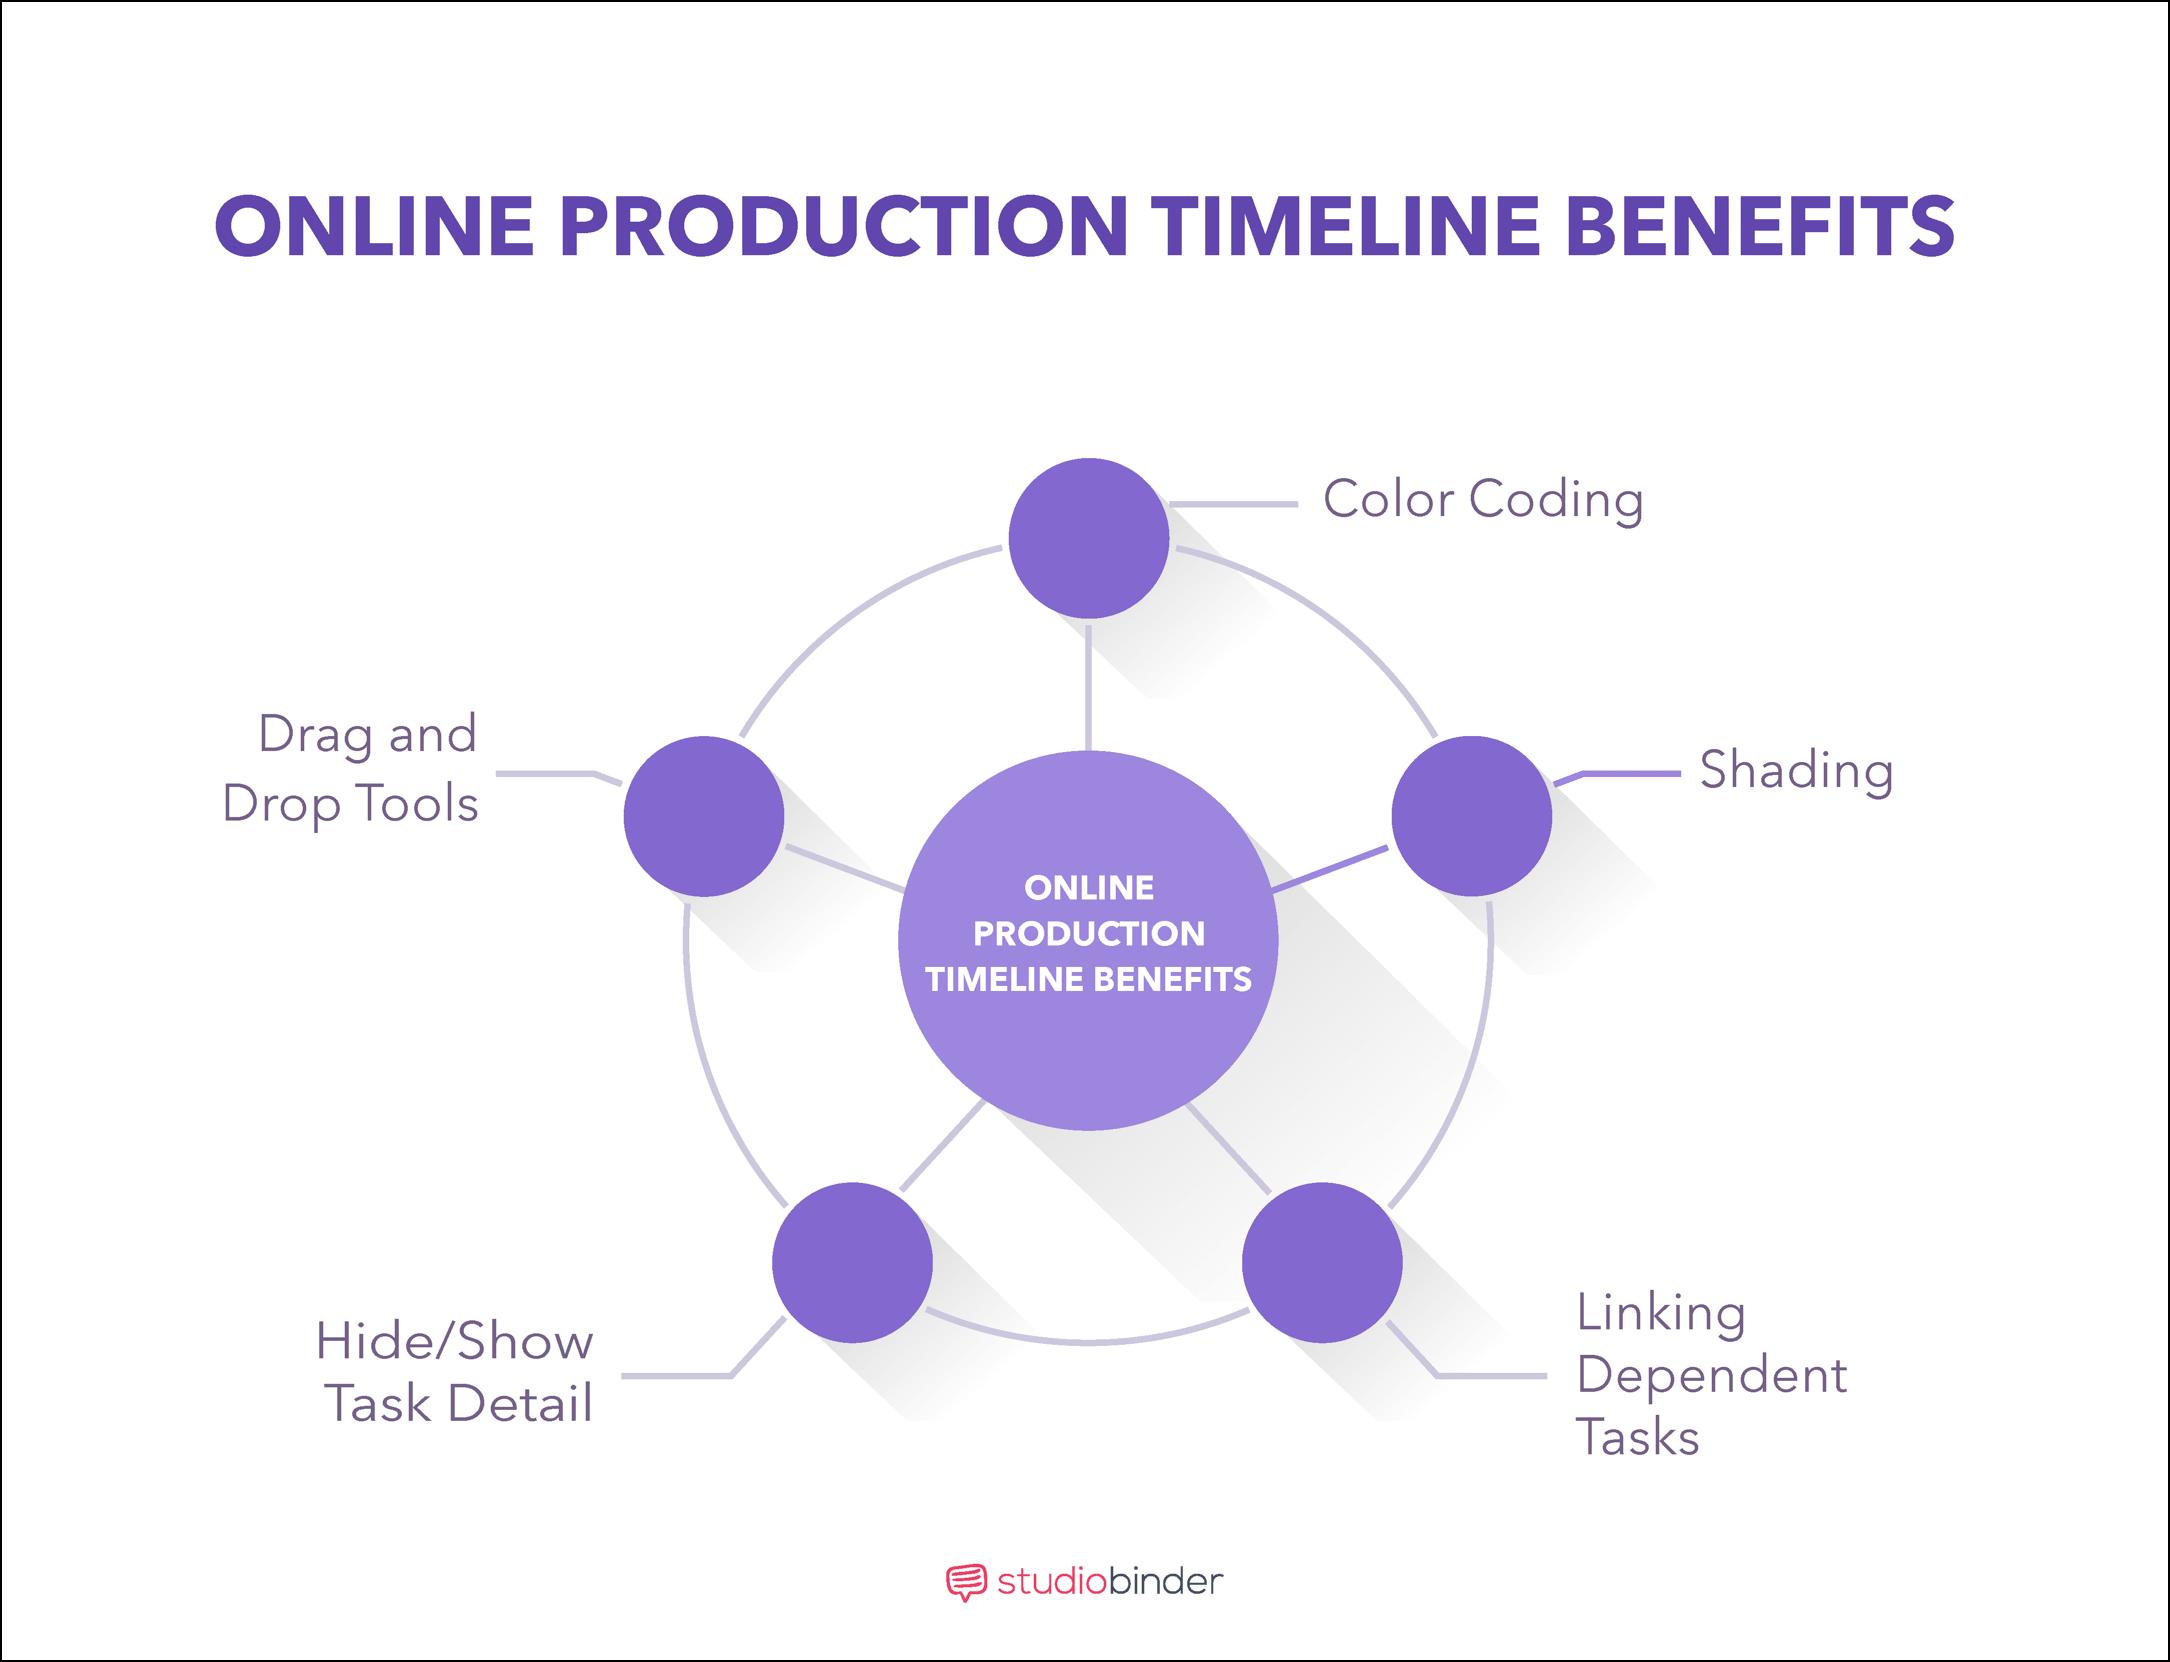 Film, Photo, & Video Production Timeline - Benefits on Production Timeline - StudioBinder